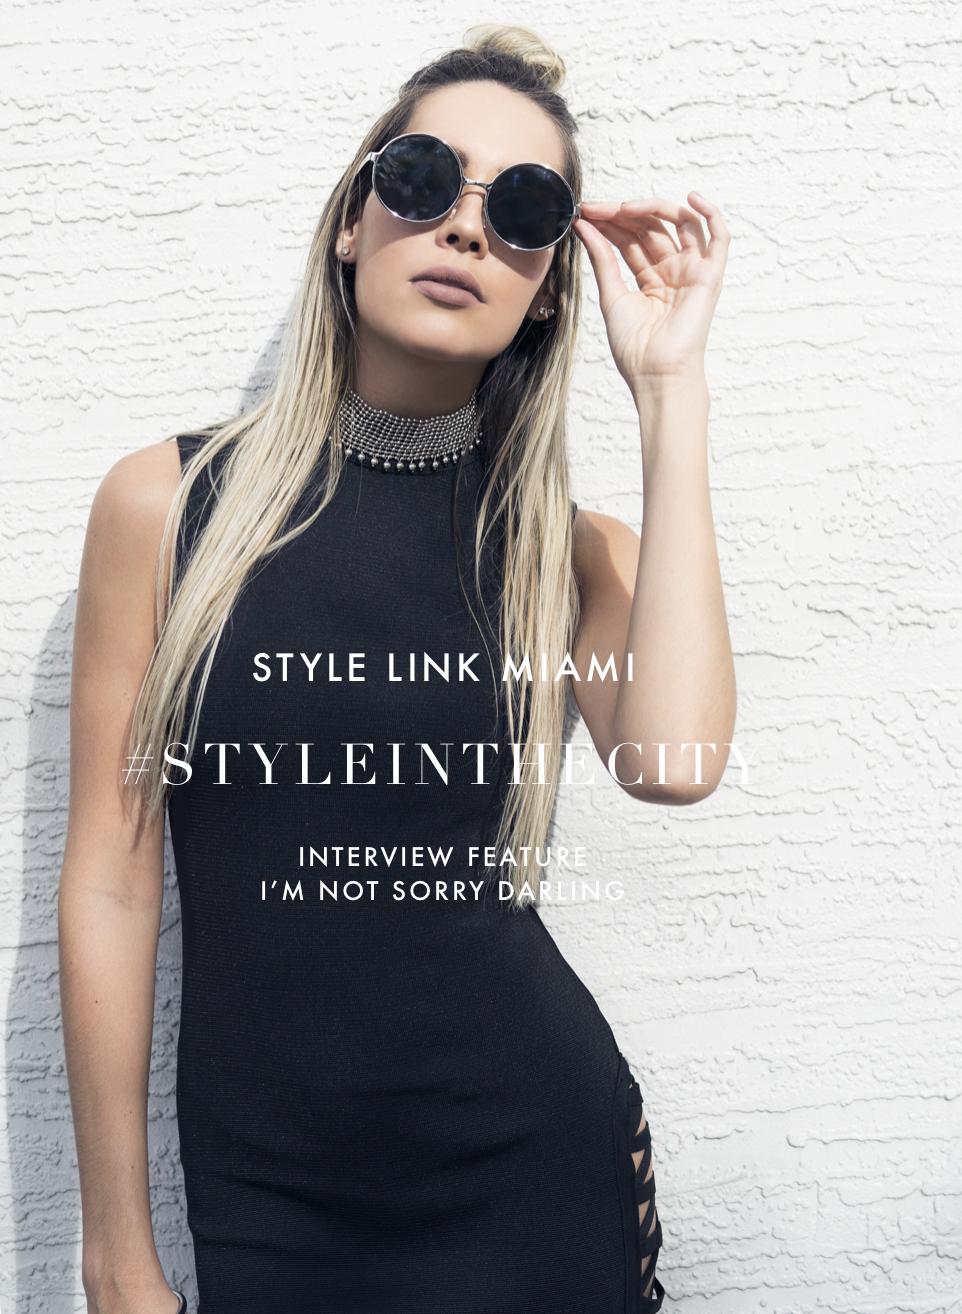 miami-fashion-blogger-im-not-sorry-darling-black-bandage-dress-style-link-miami-illy-perez